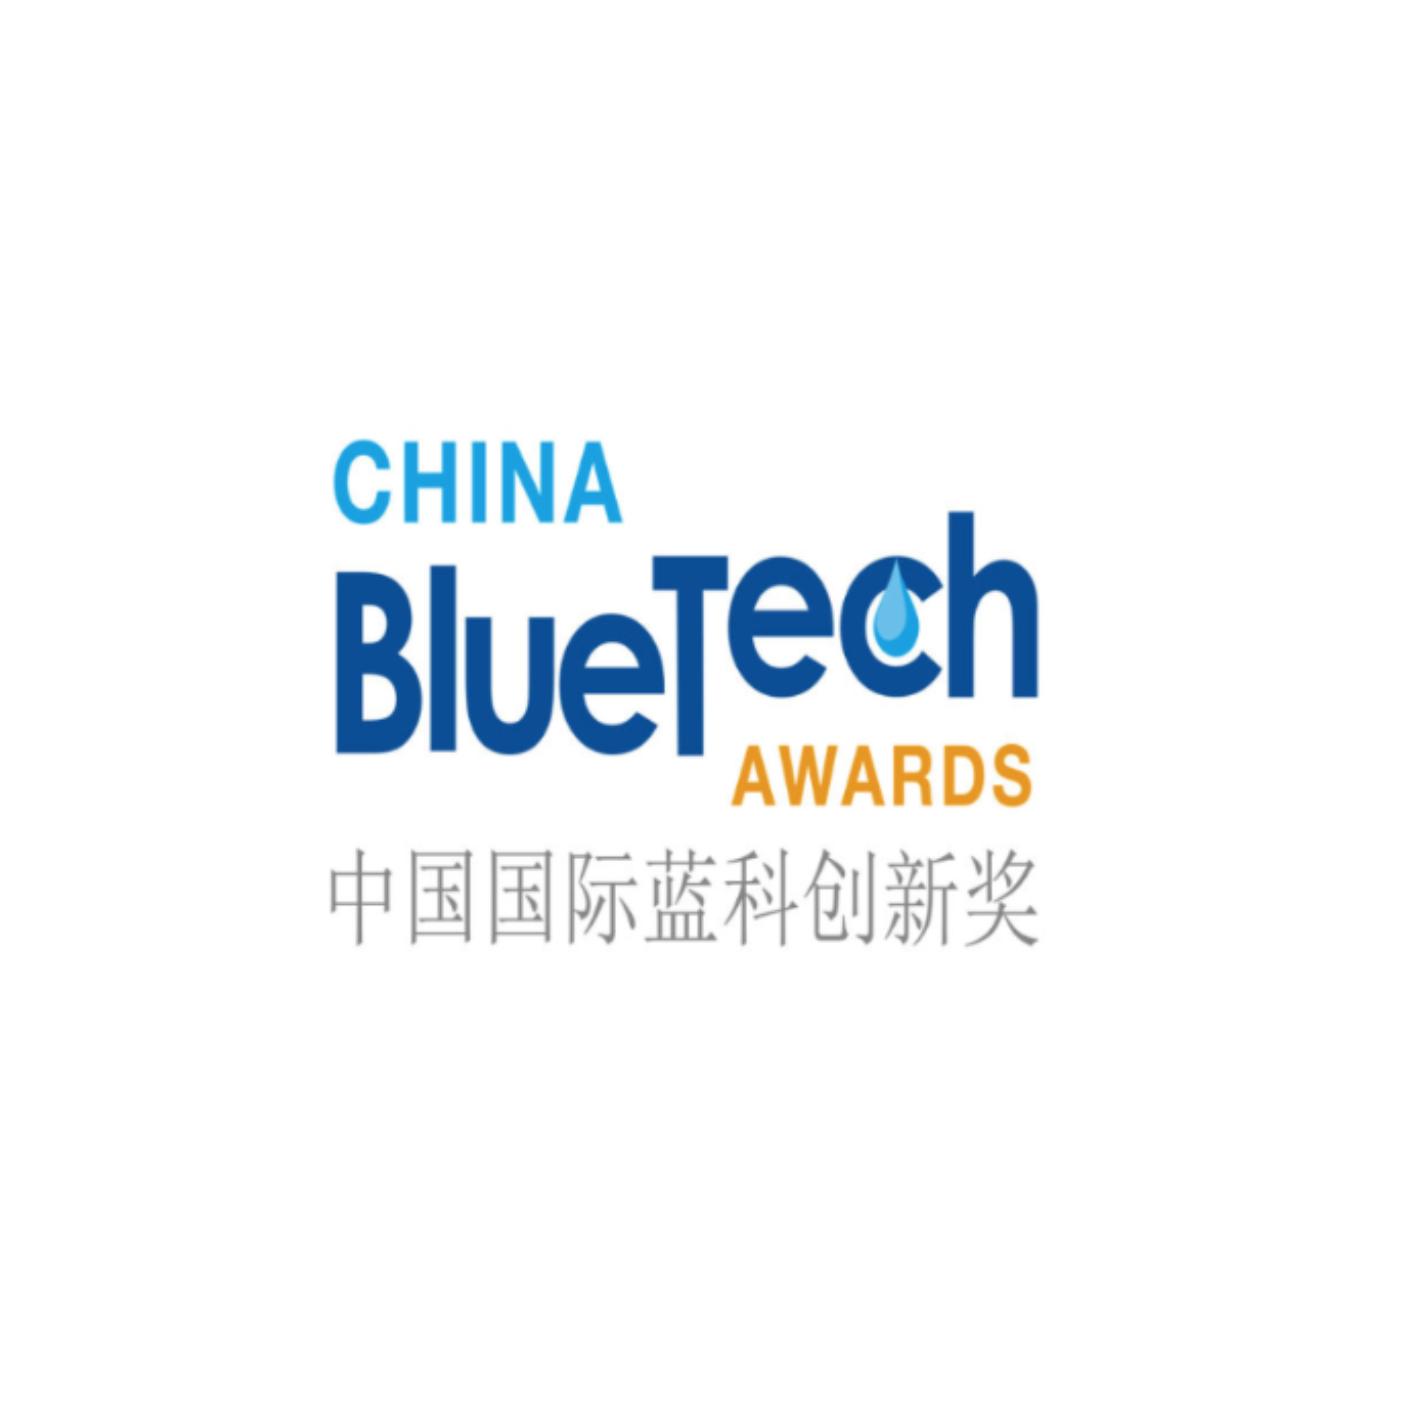 China BlueTech Awards 2018 Application Ending Soon